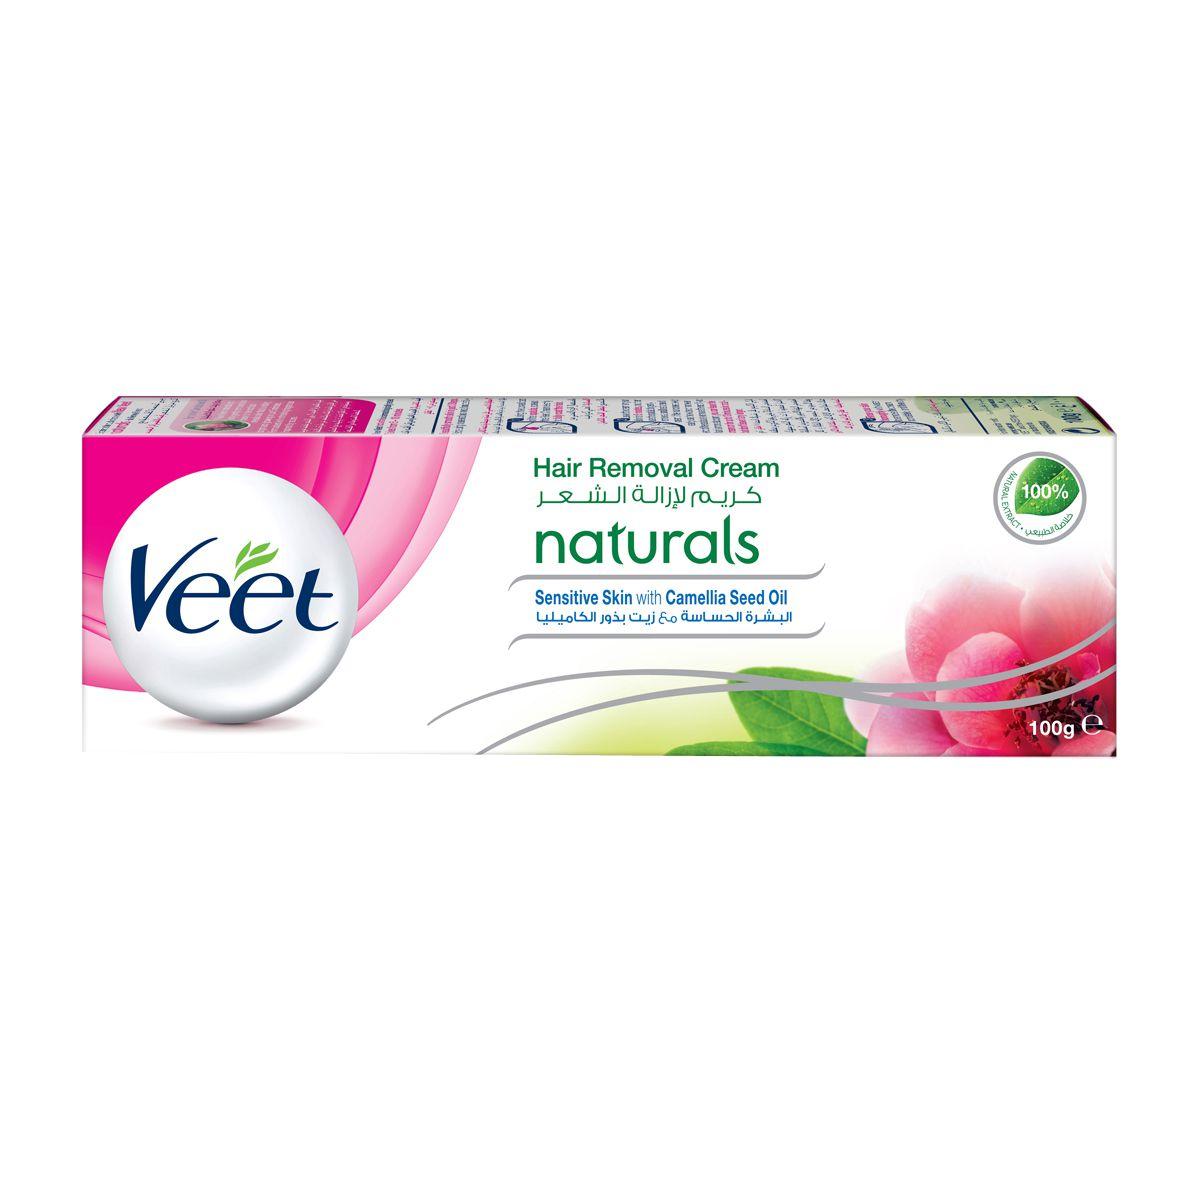 100g Veet Hair Remover Cream Naturals Sensitive Skin With Camelia